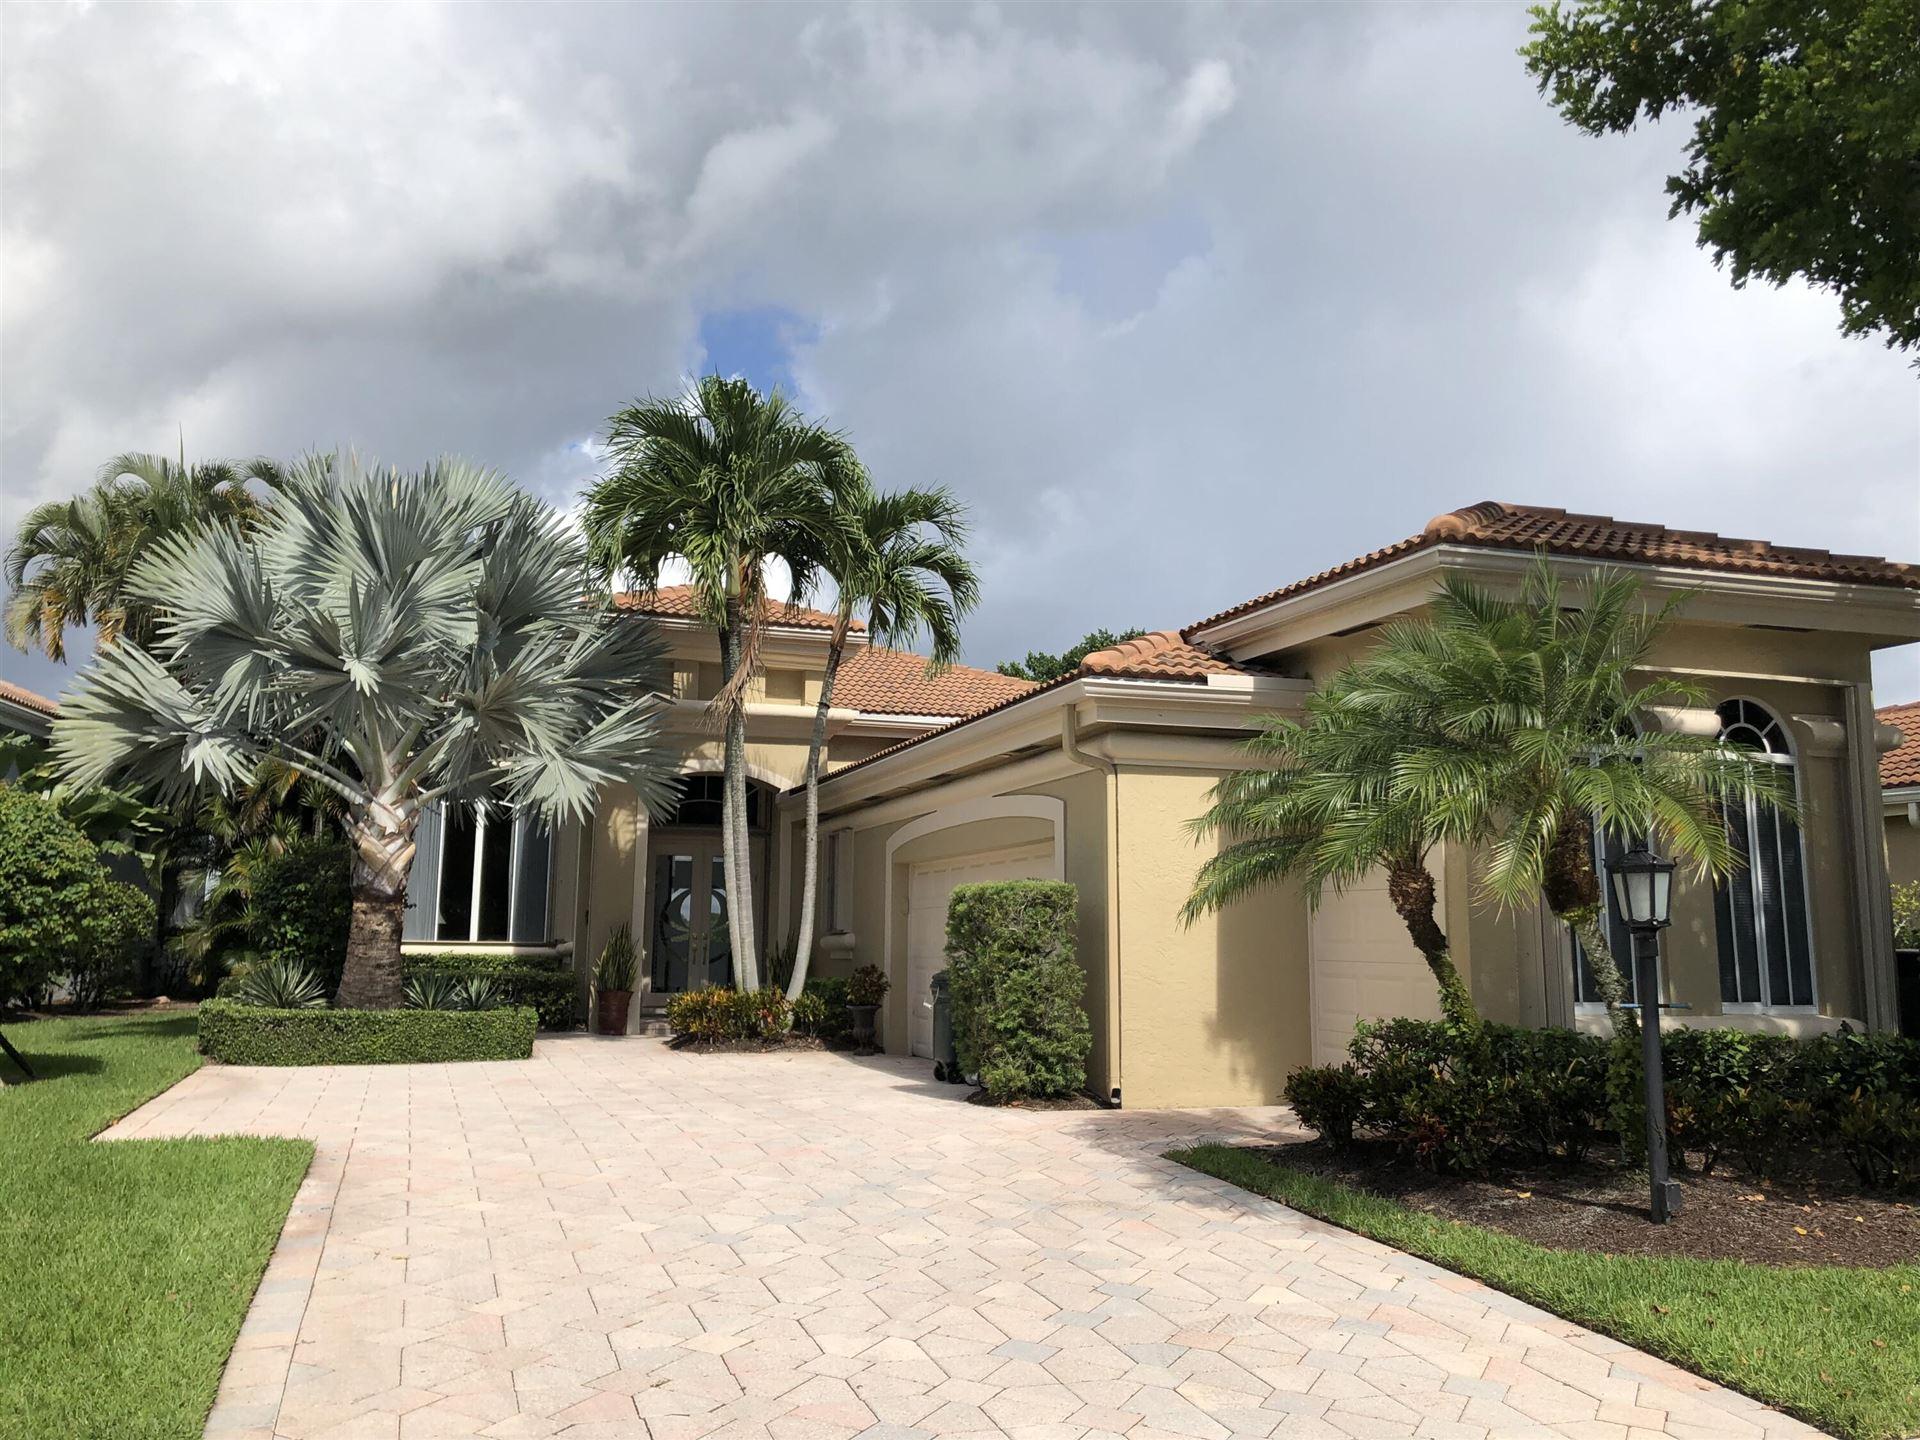 Photo for 261 Isle Way, Palm Beach Gardens, FL 33418 (MLS # RX-10751326)